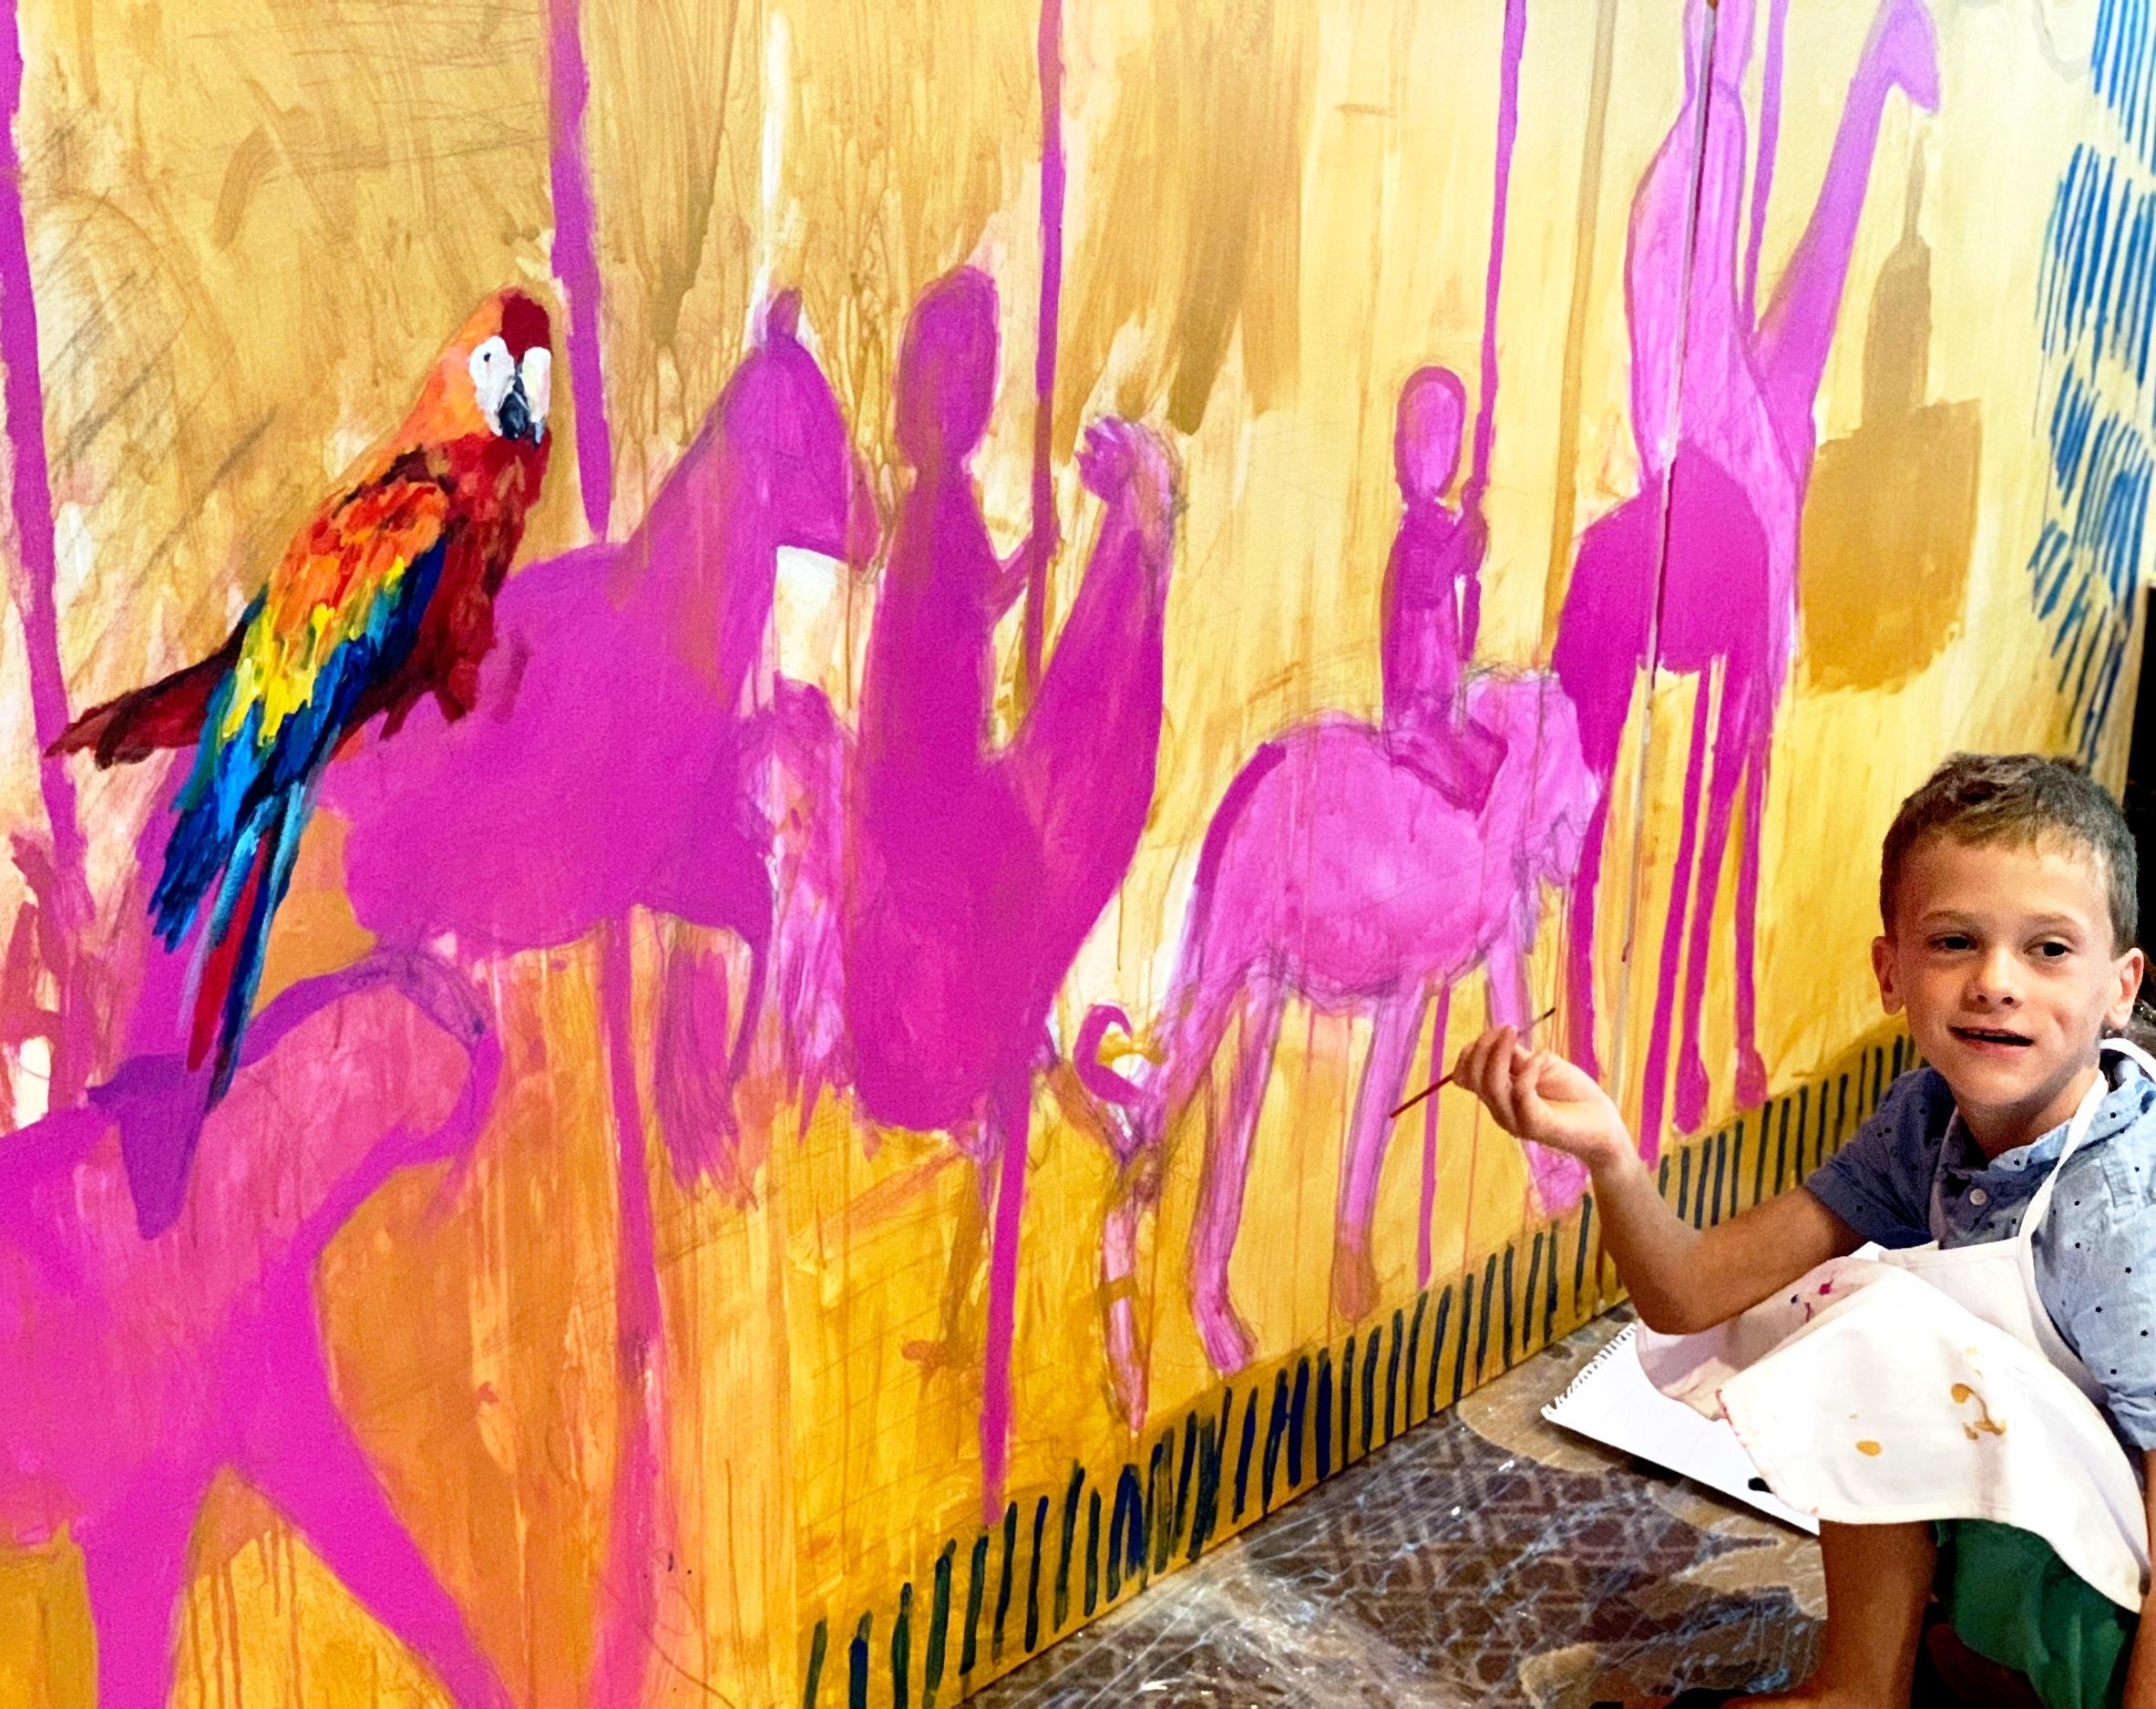 Mural-HotelAtPlay-DC-Swirl-FourSeasons.jpg